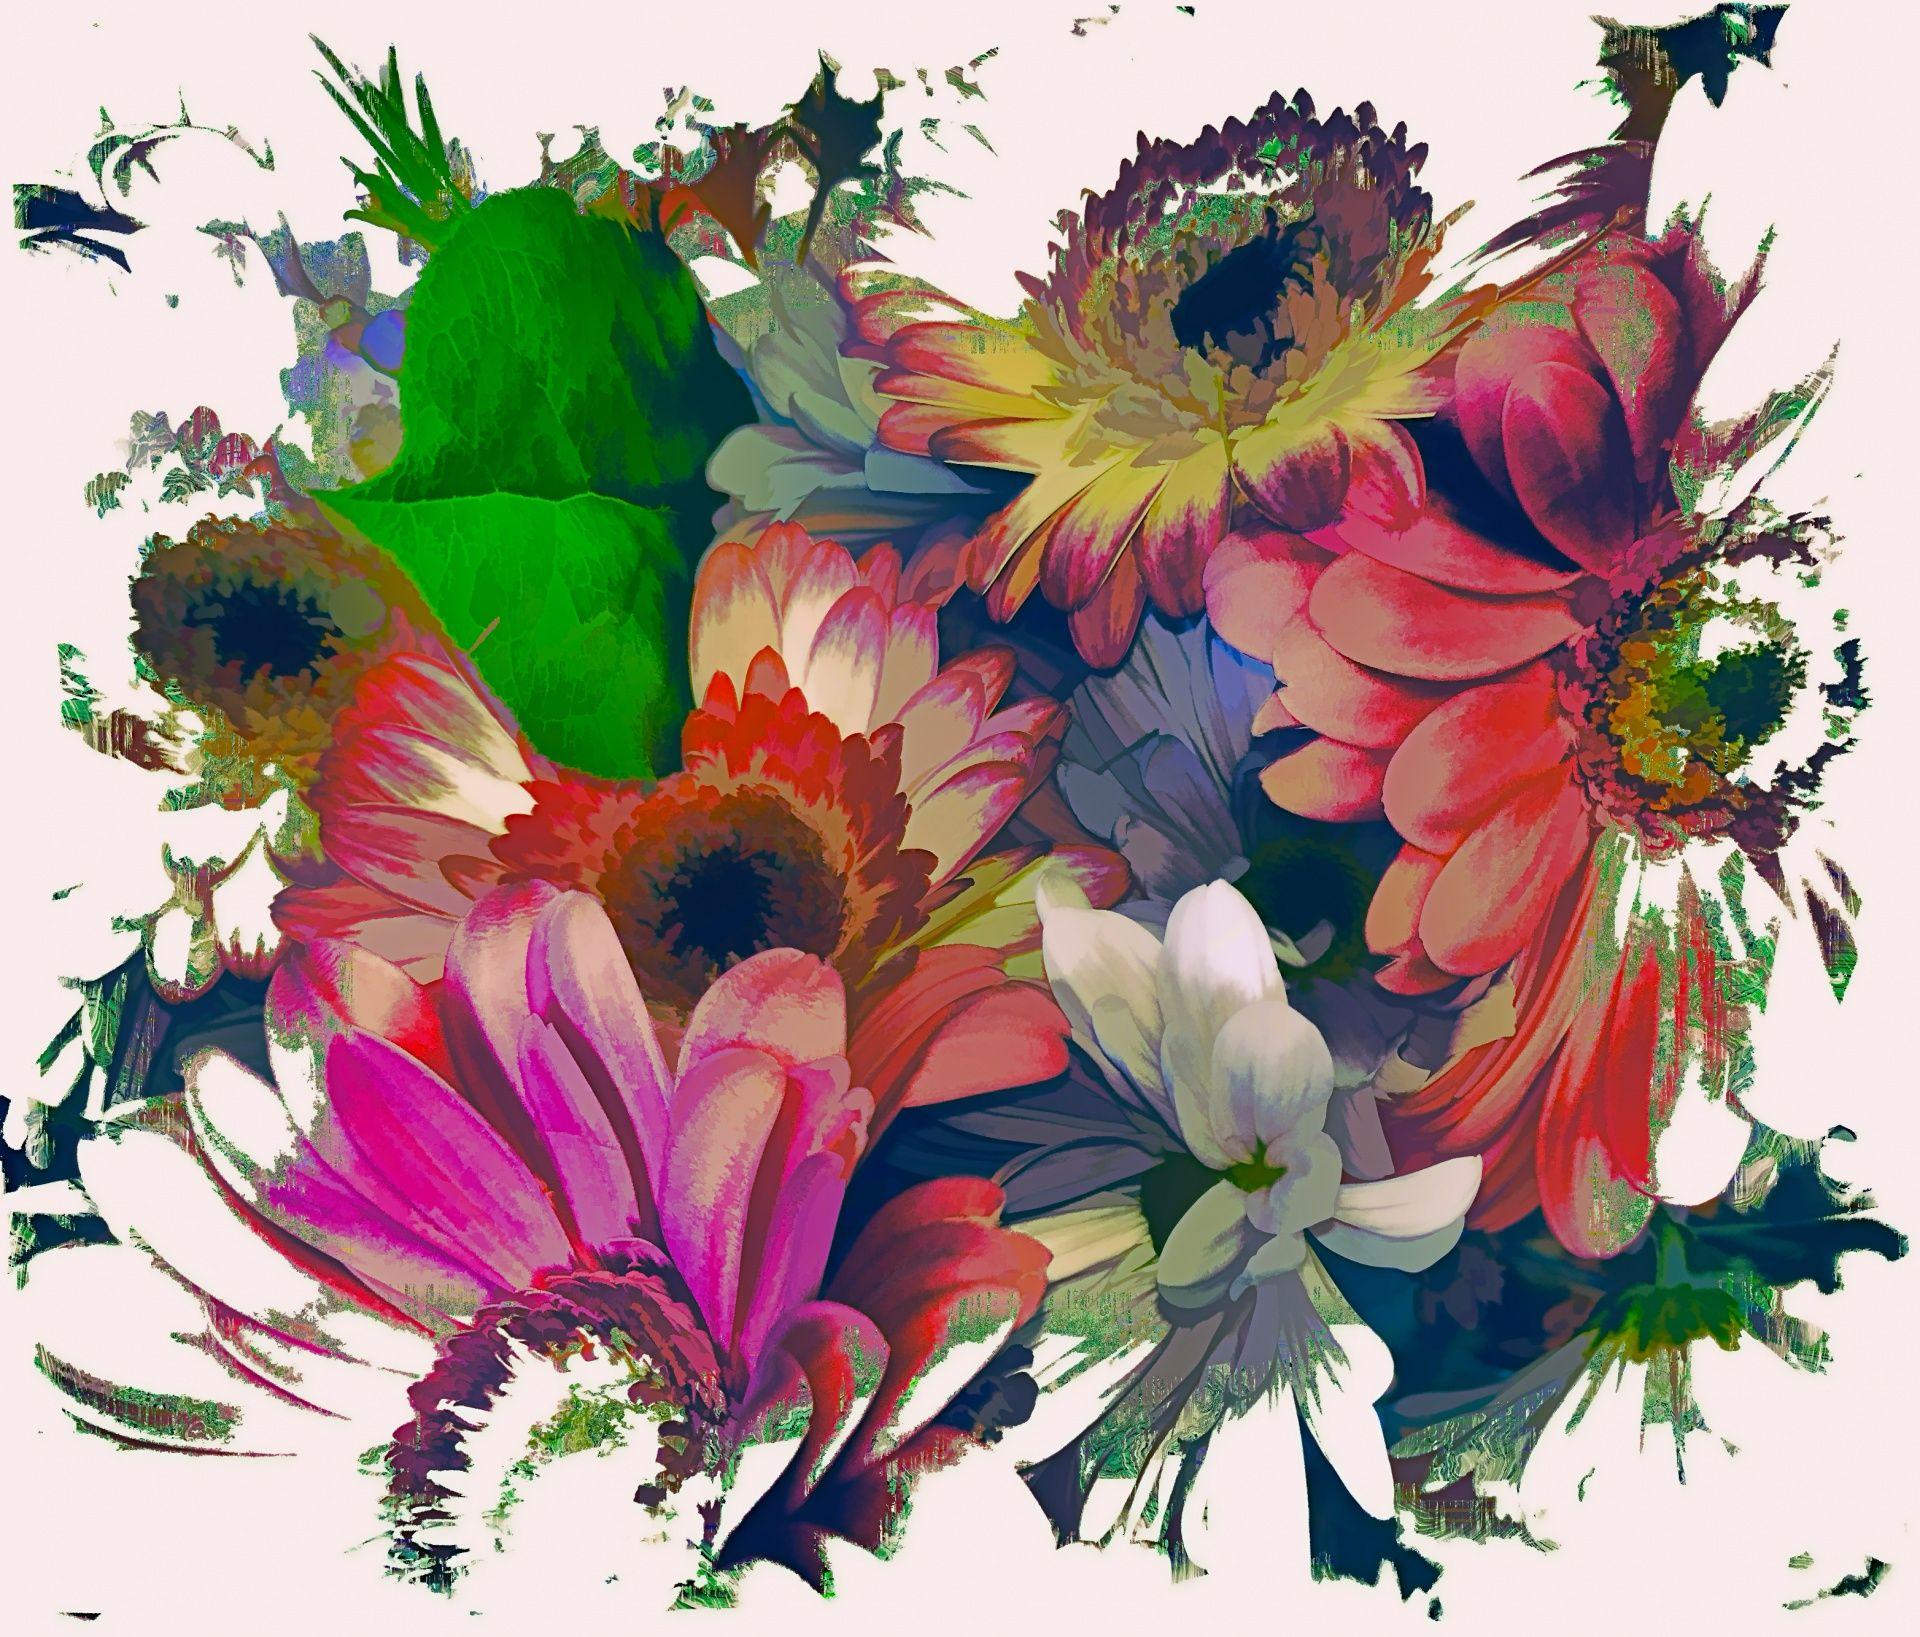 Artistic Flowers Artist Art Graphic Art